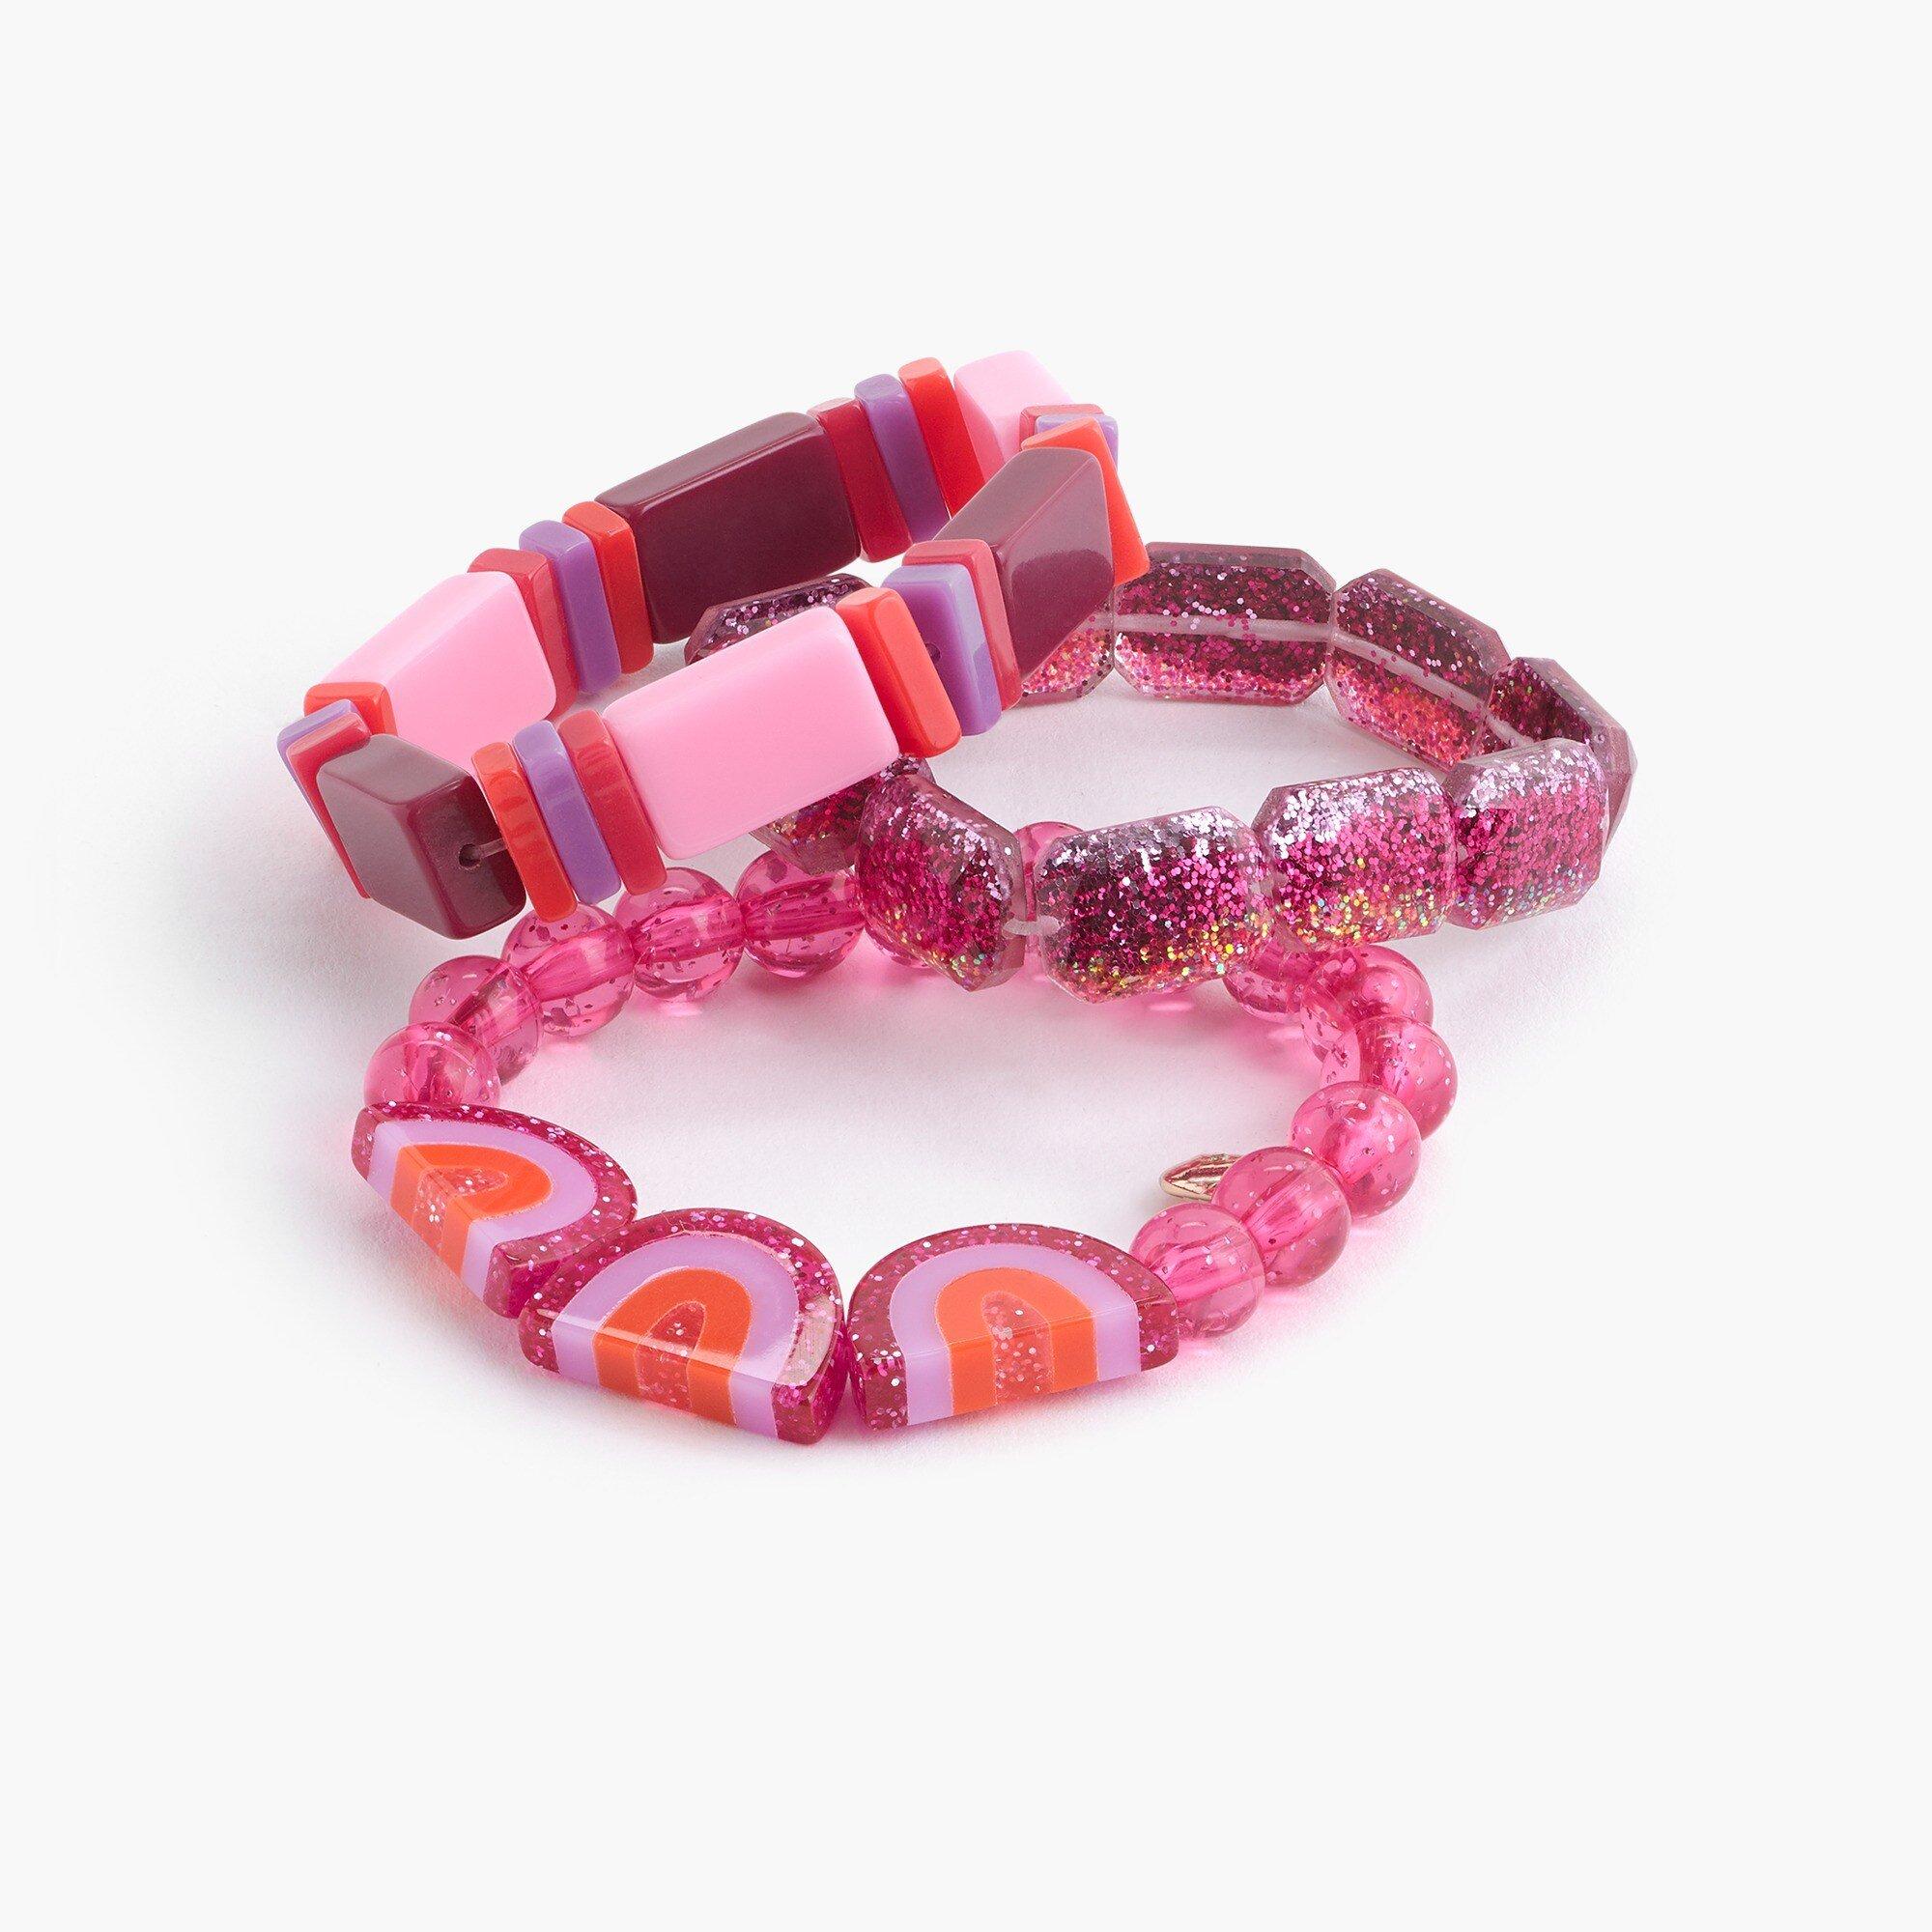 J.Crew: Girls' Rainbow Bracelet Three-pack